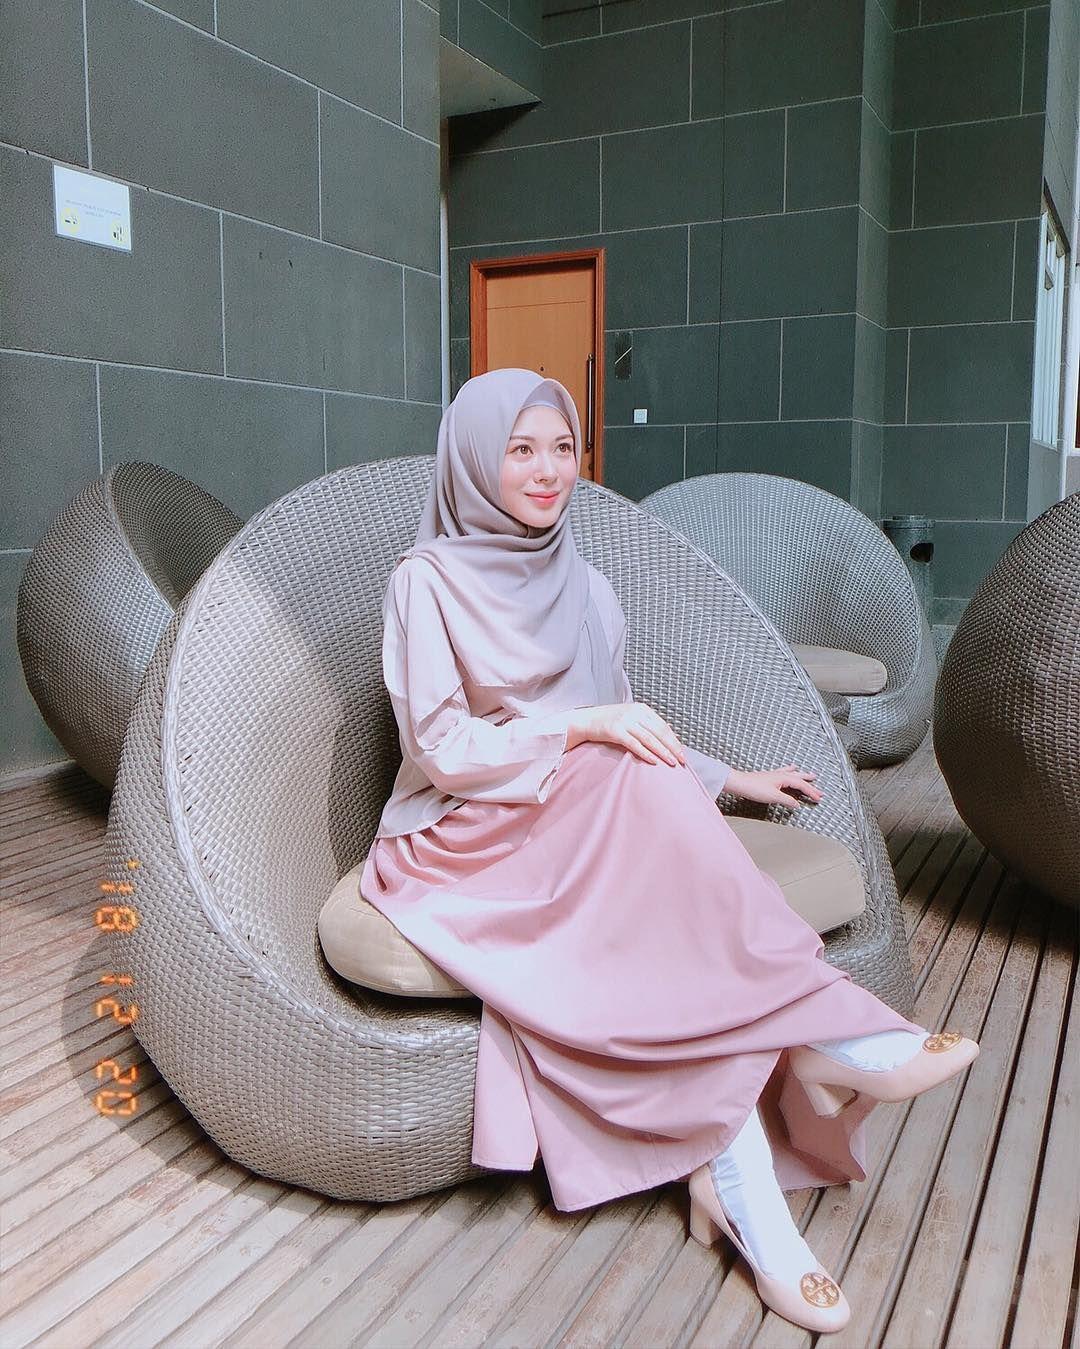 Ragam Penampilan Ayana Moon Mualaf Korea Selatan Pengagum Uas Artis Di 2021 Model Pakaian Gadis Berjilbab Model Pakaian Hijab